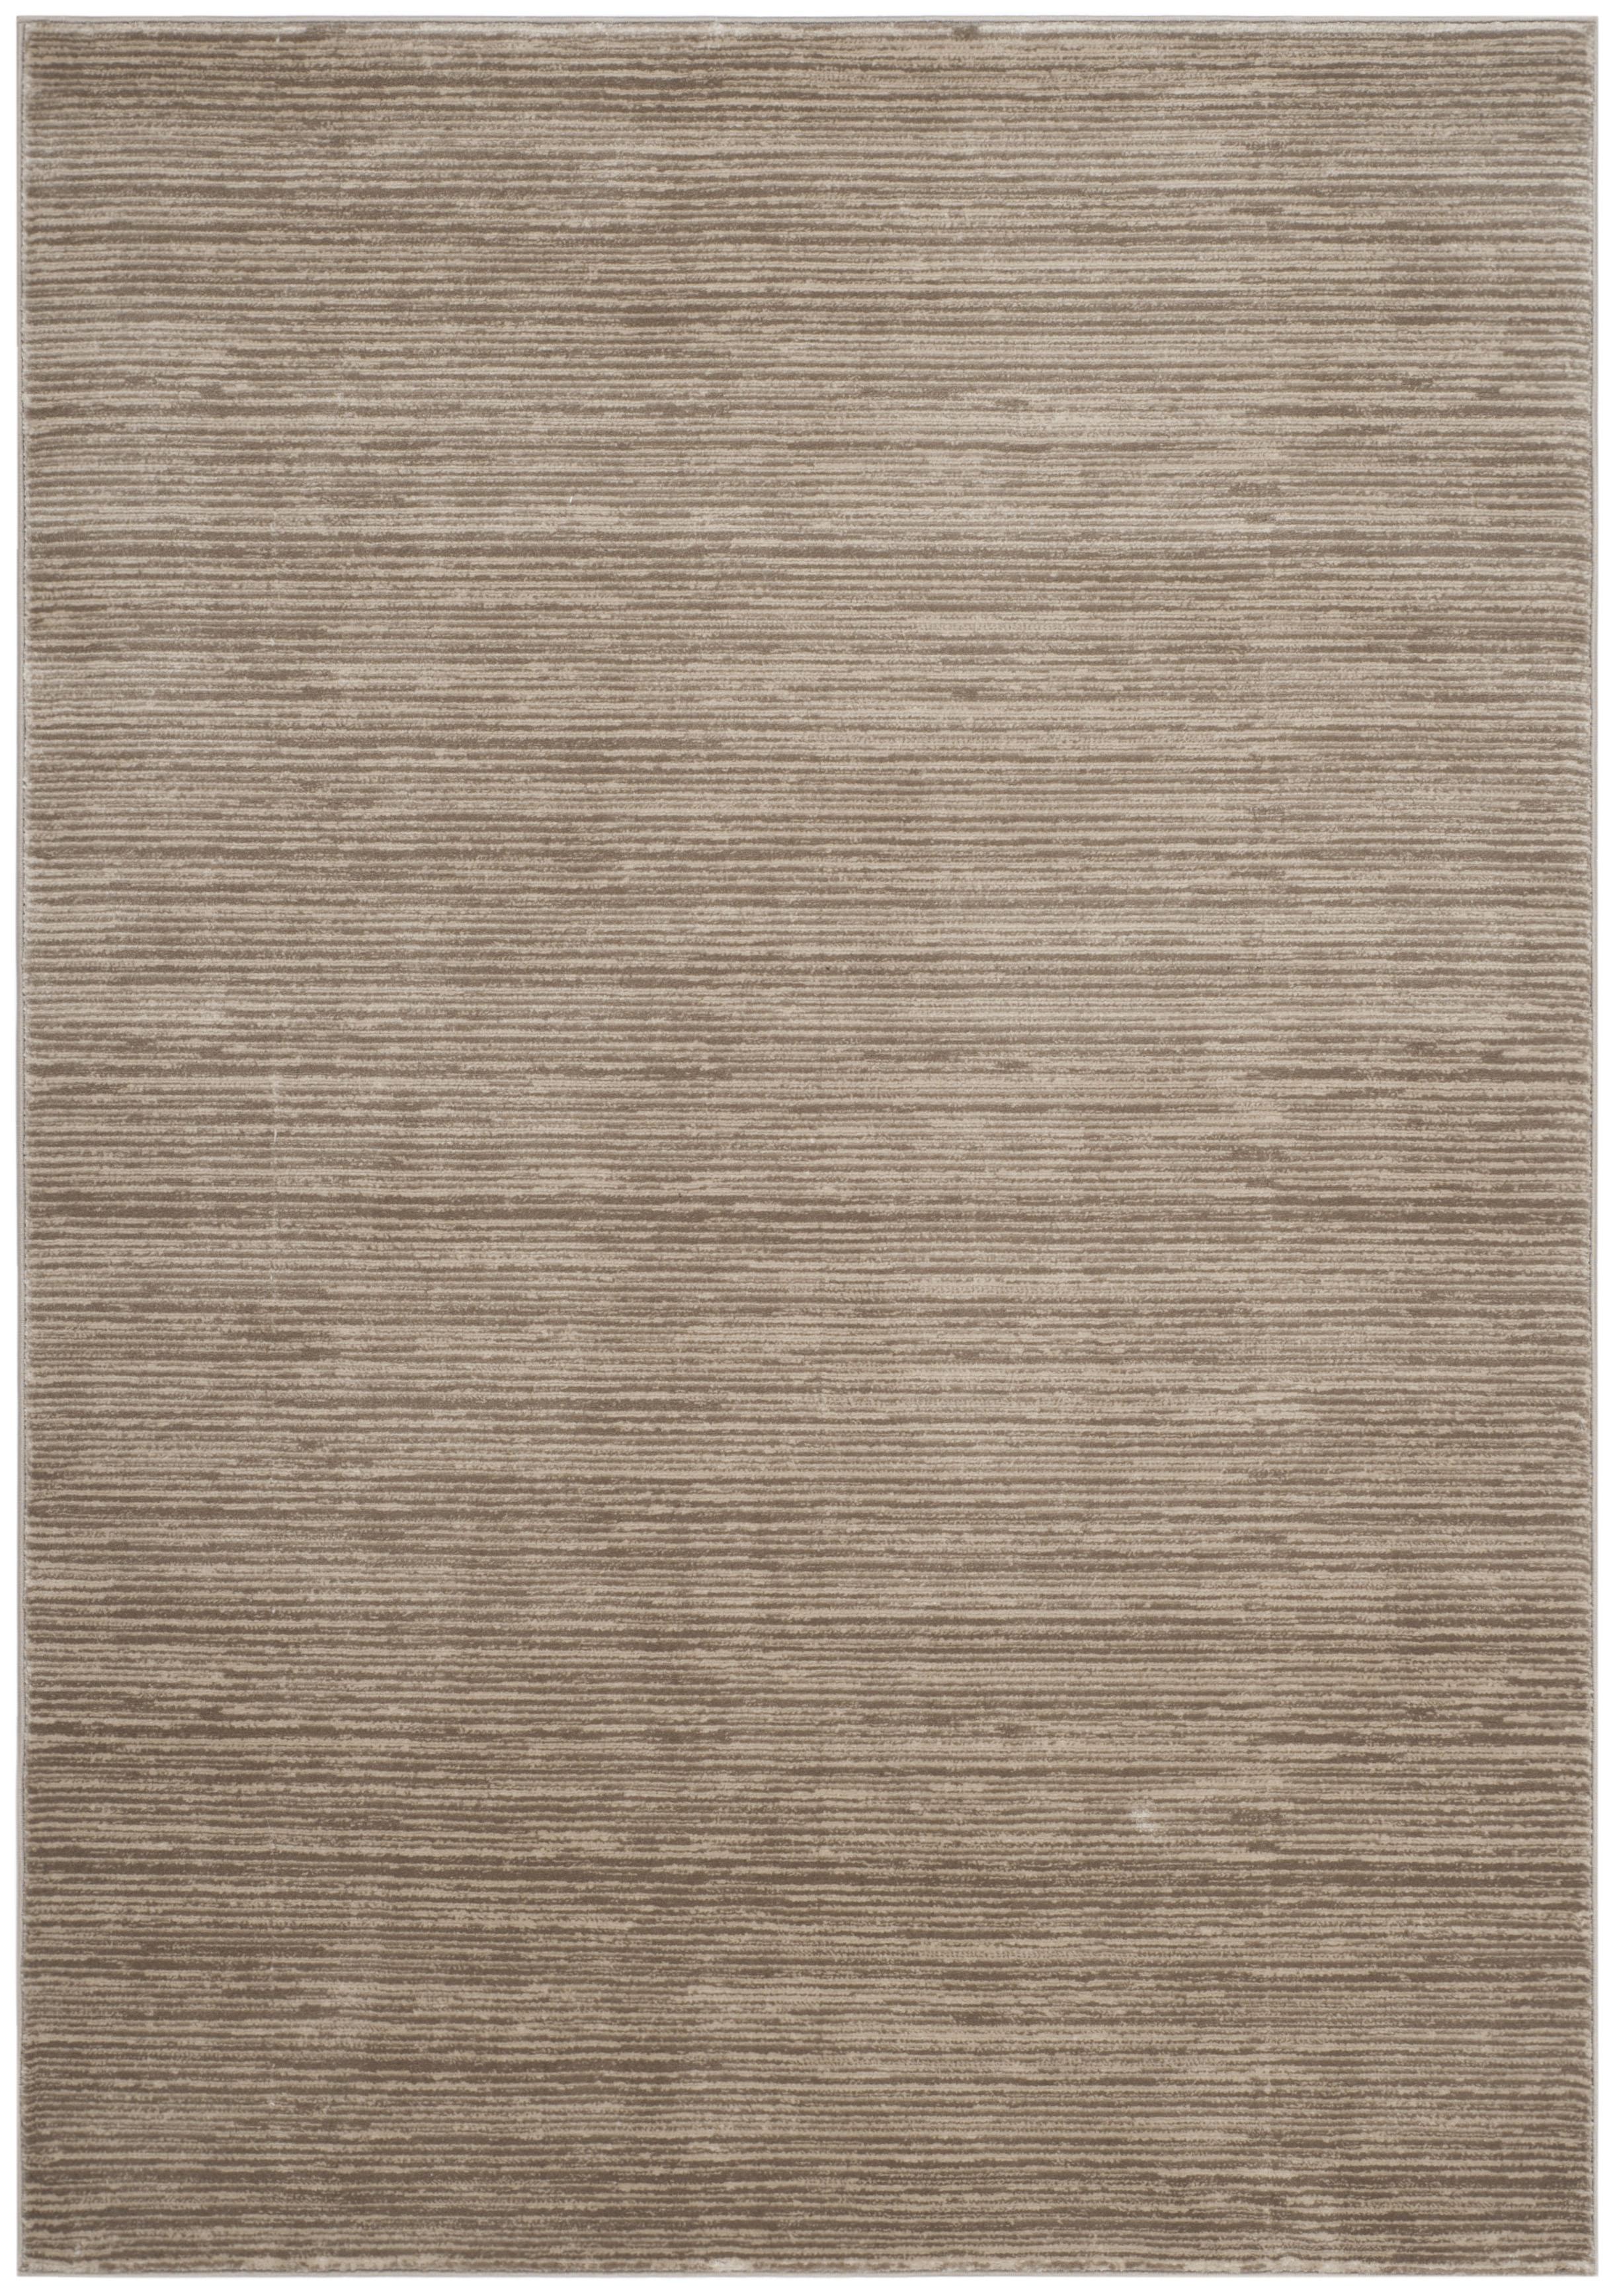 Tapis de salon contemporain  marron clair 160x230